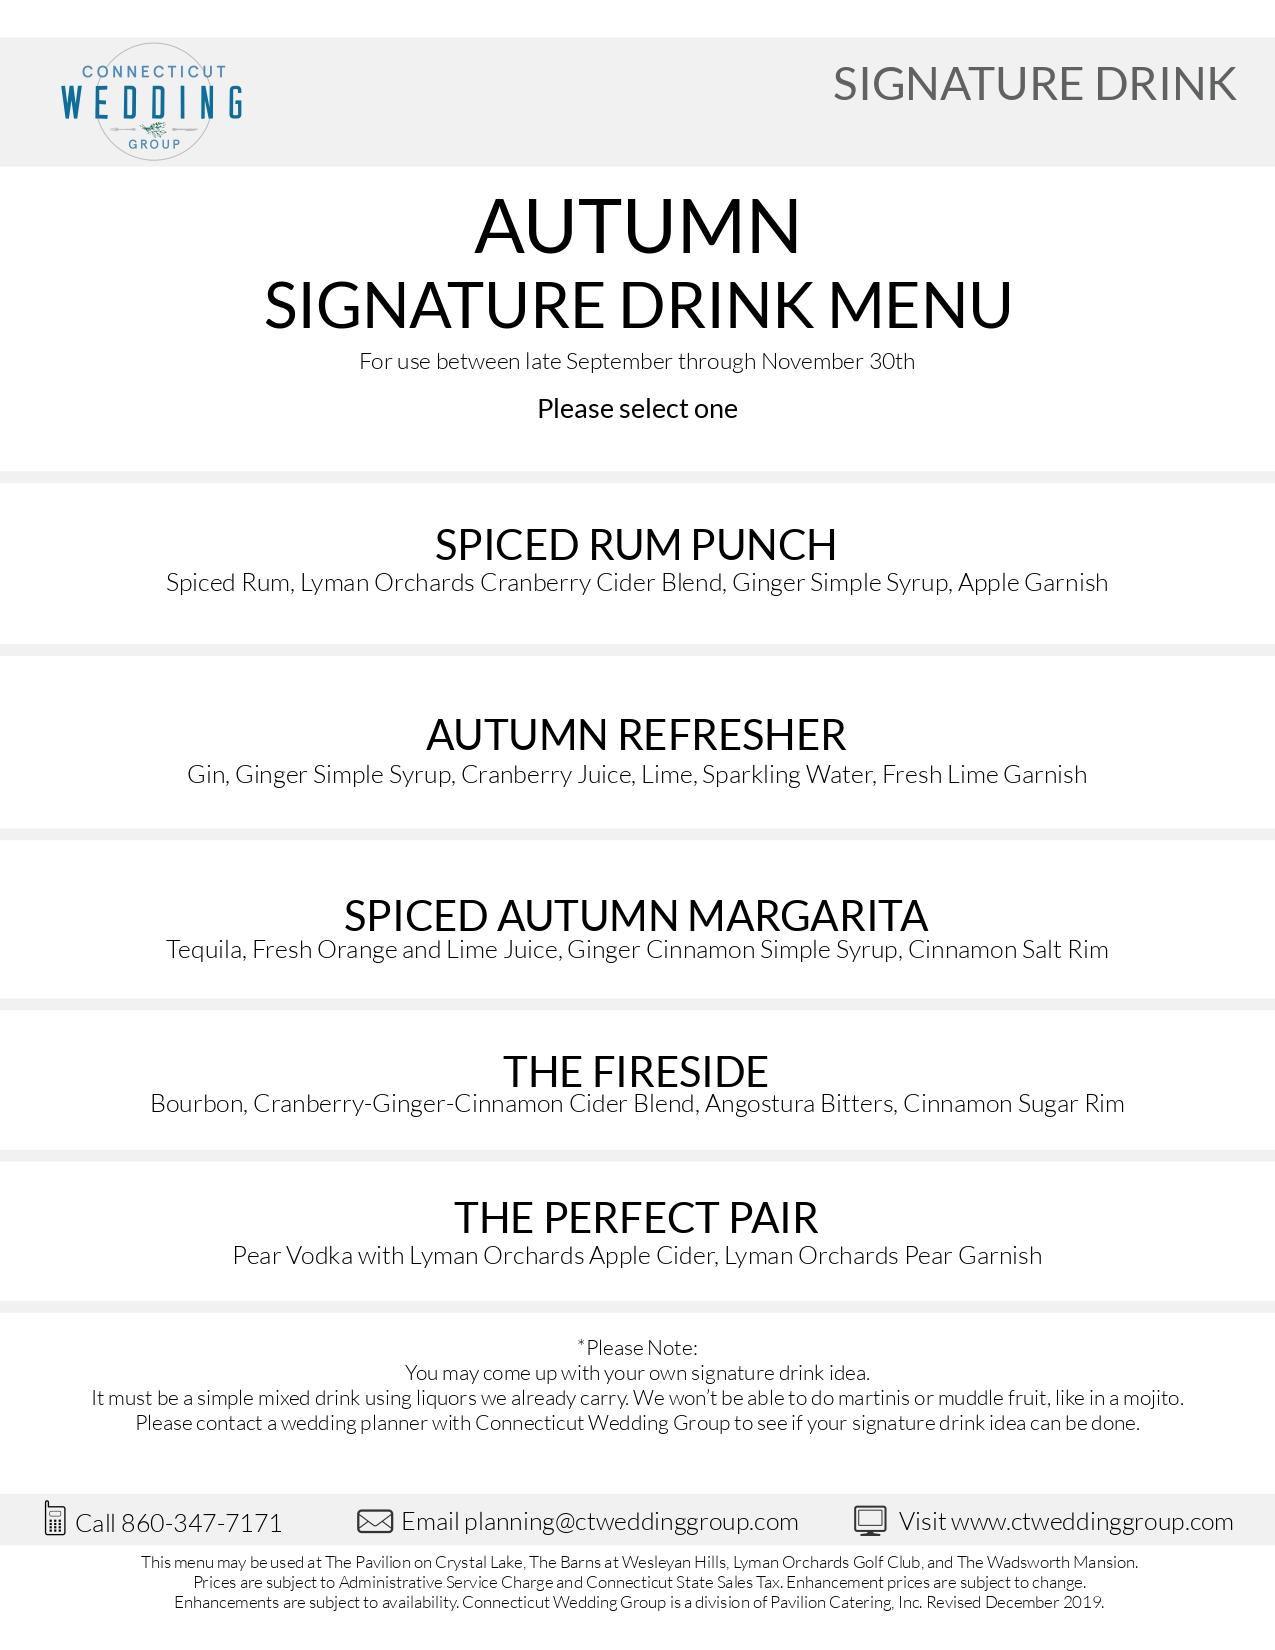 Autumn-Signature-Drink-Menu_2022_page-0001